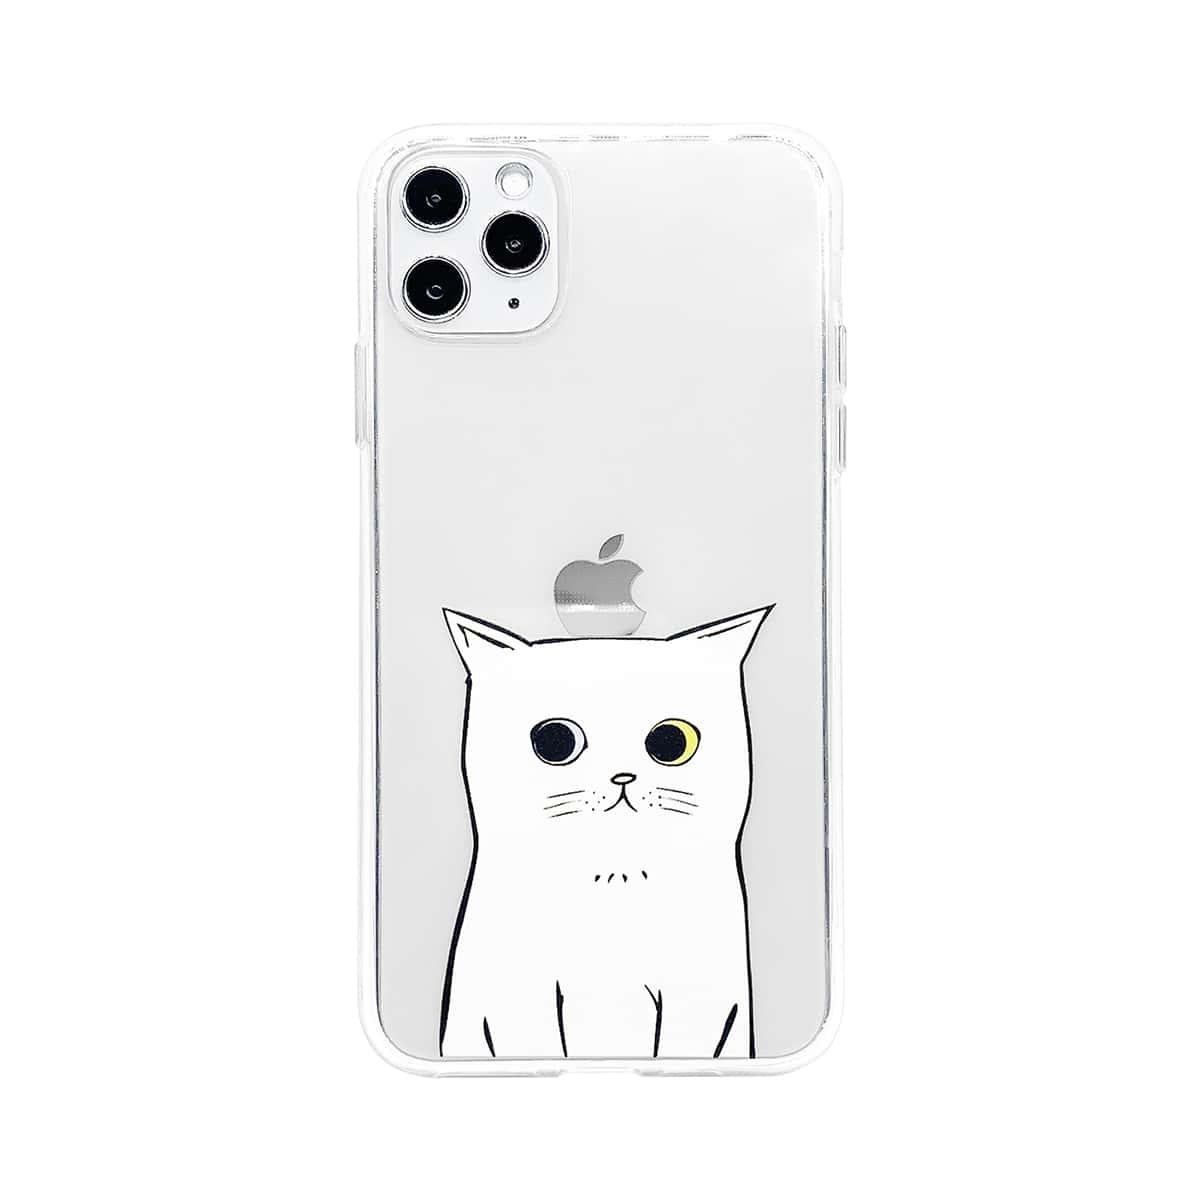 1шт прозрачный чехол для iPhone с узором кота фото